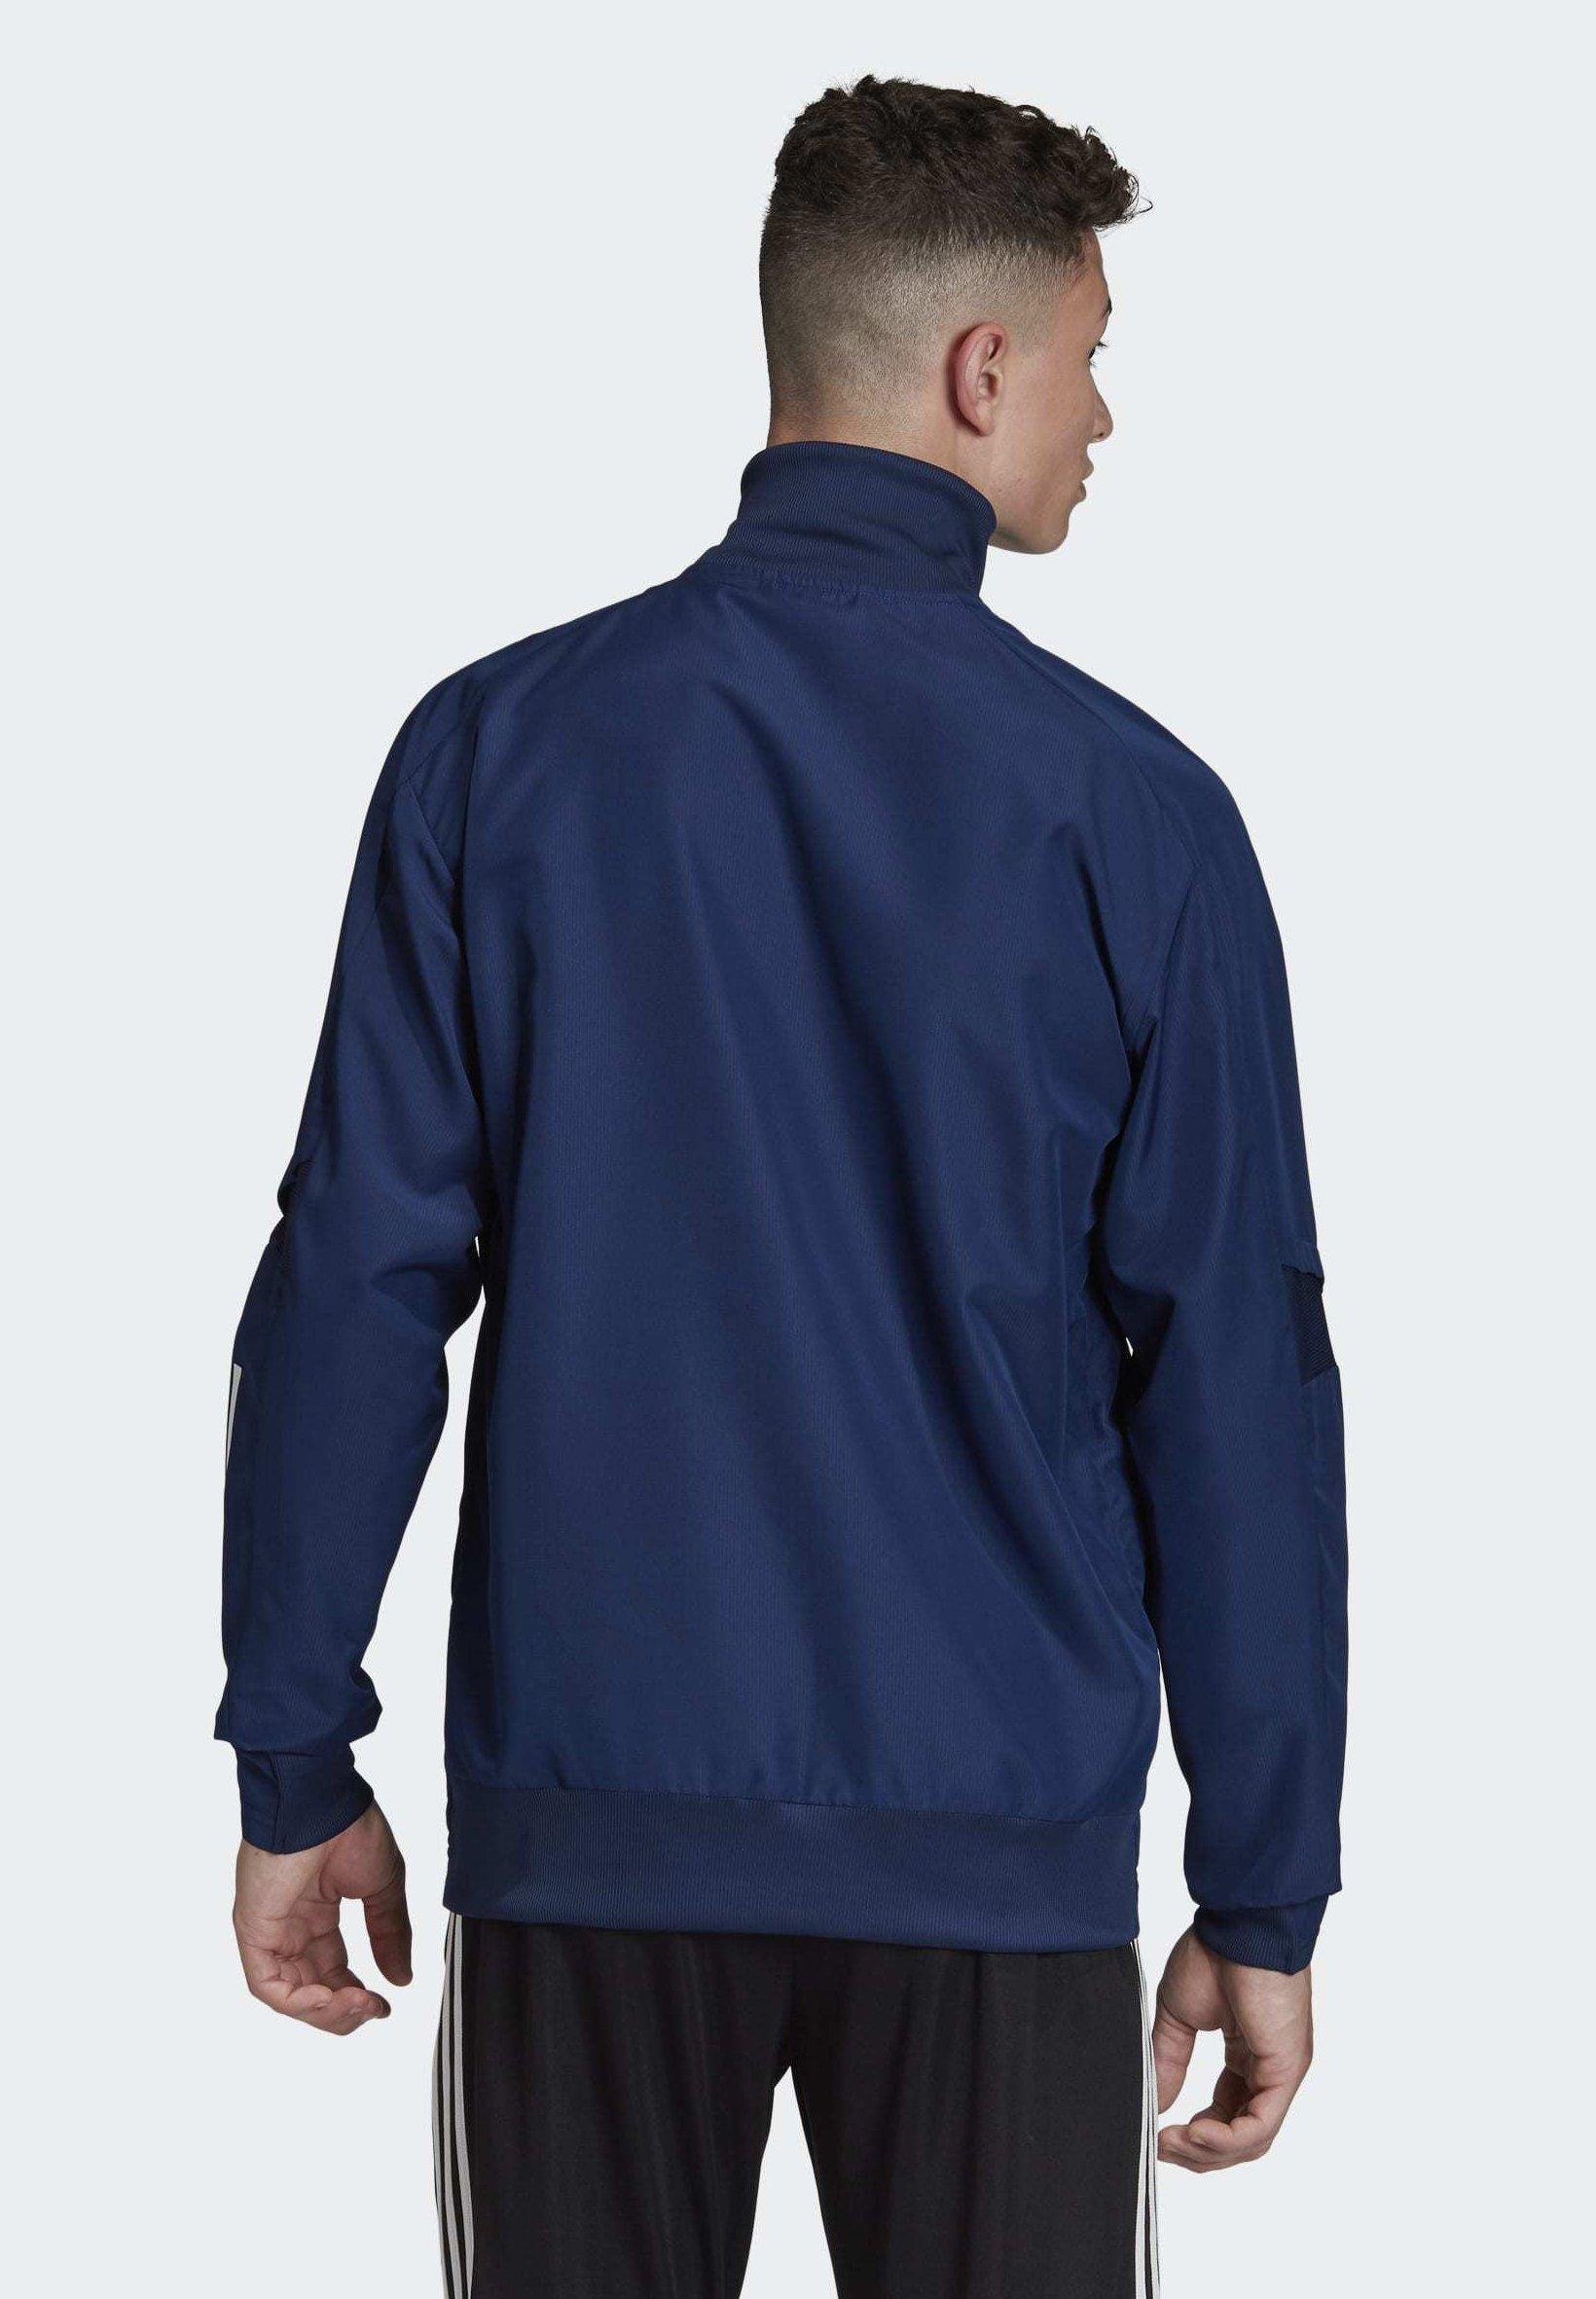 Men CONDIVO 20 PRE-MATCH TRACKSUIT - Training jacket